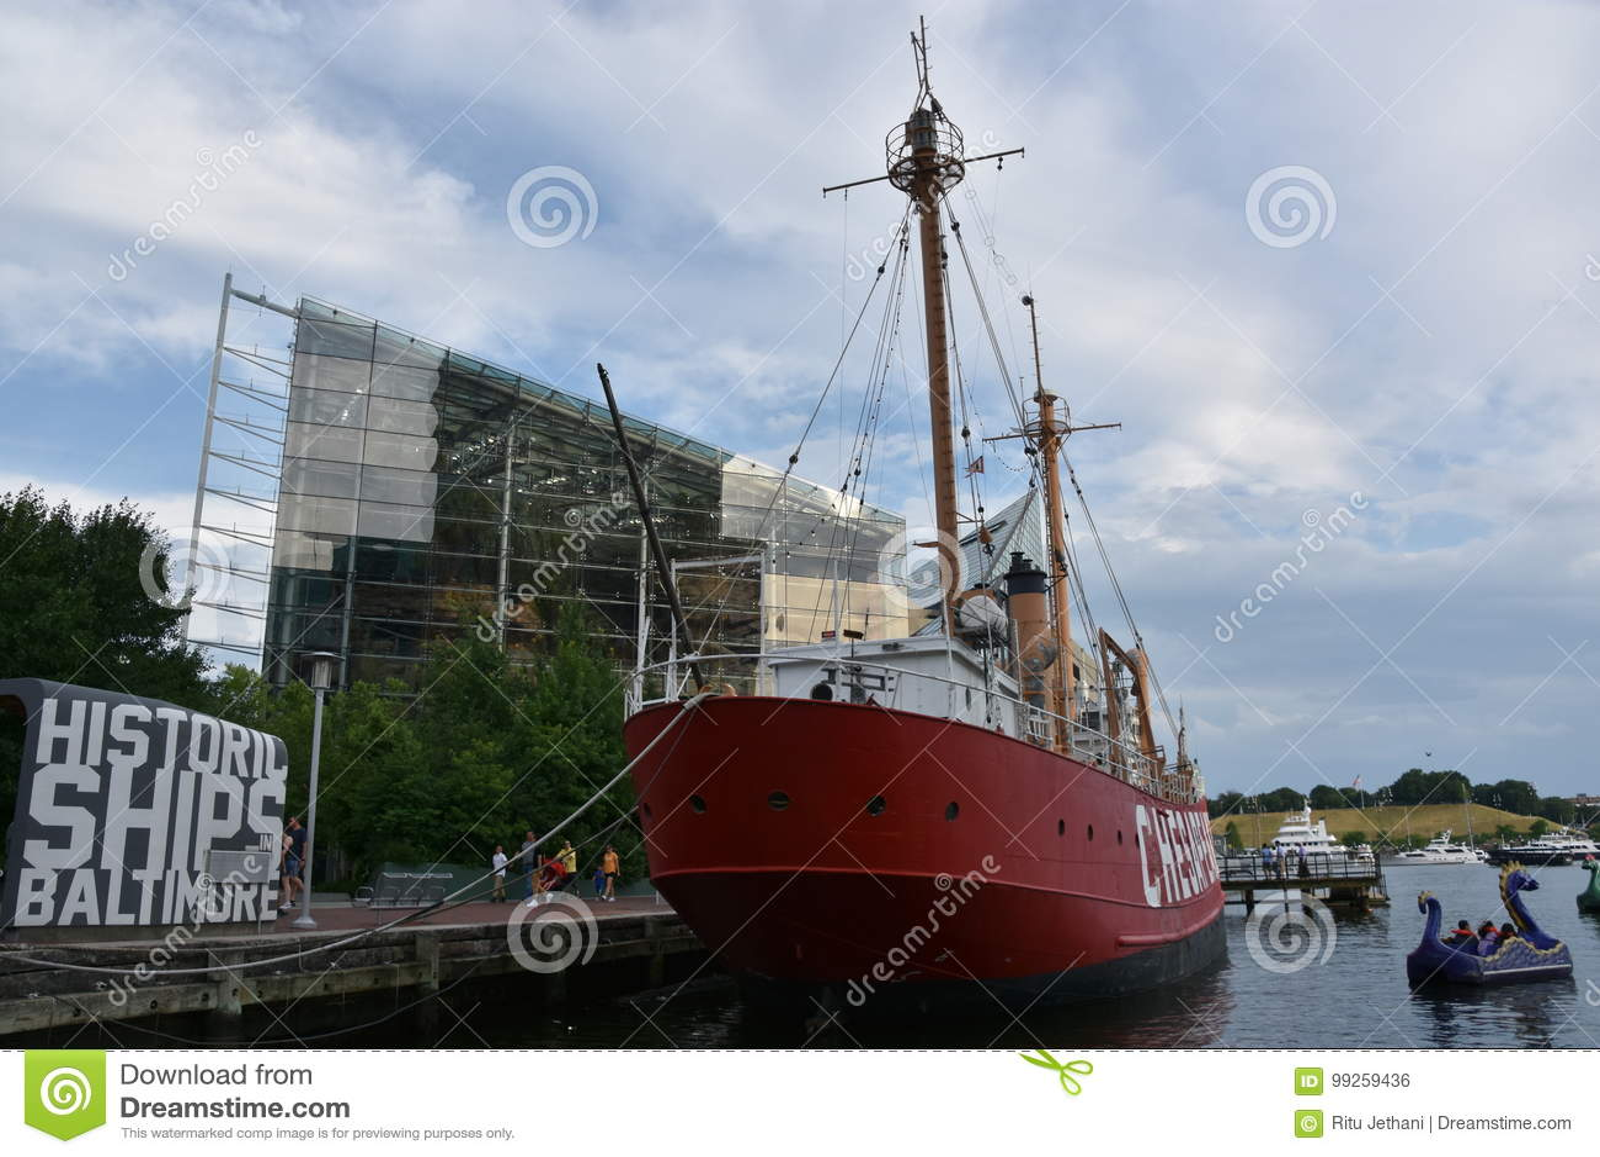 Chesapeake Ηνωμένων πλωτών φάρων LV-116 στη Βαλτιμόρη, Μέρυλαντ